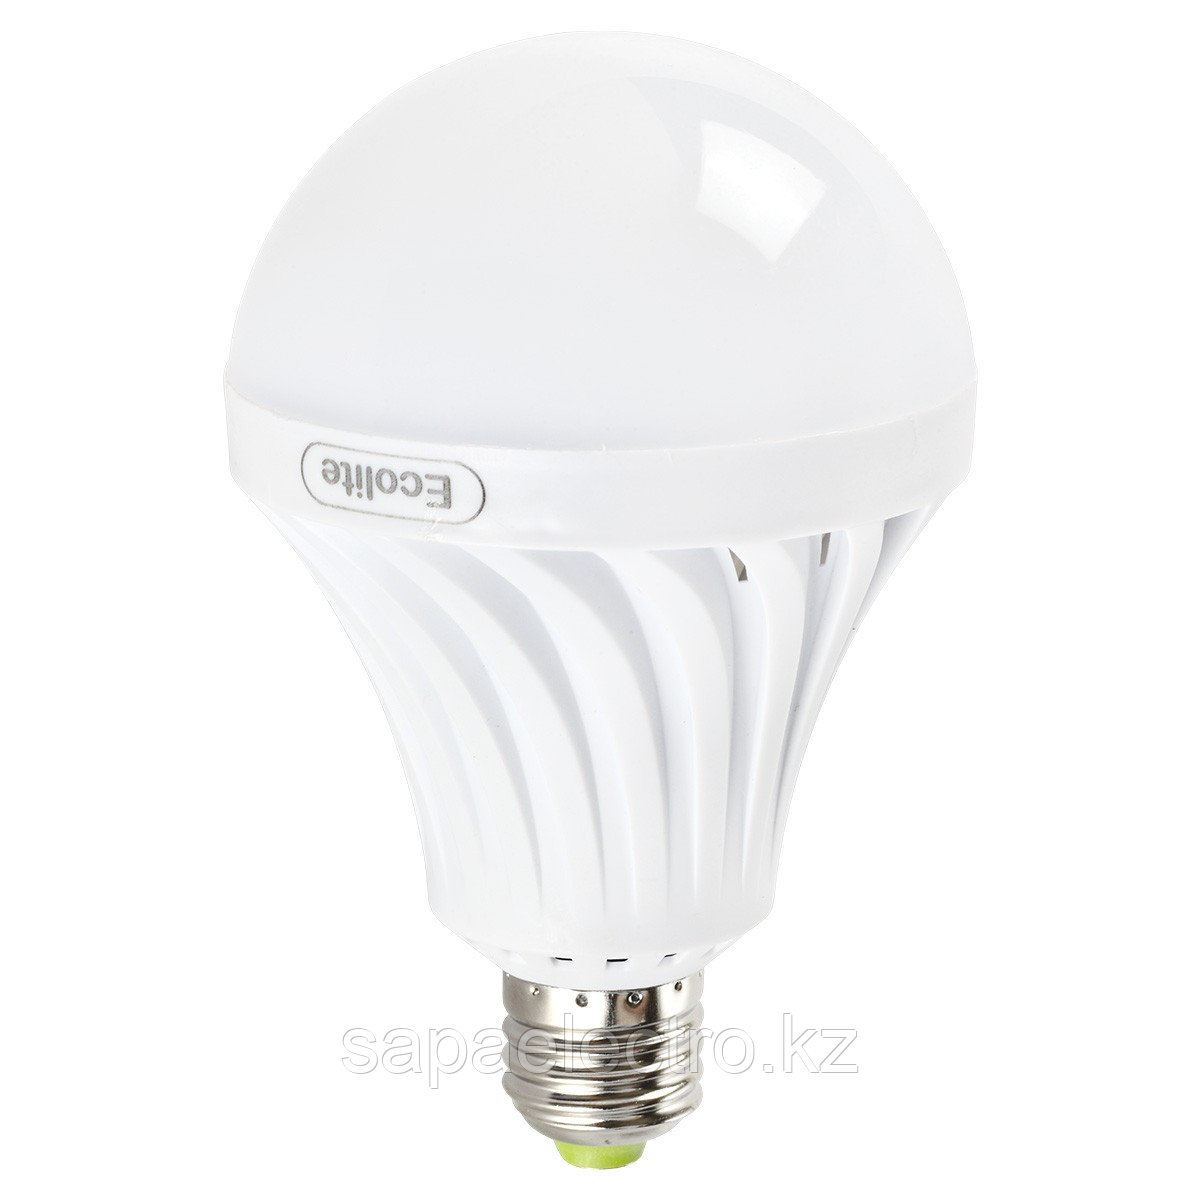 Лампа LED AVARIINAIA 9W E27 6000K AC85-265V 550LM (